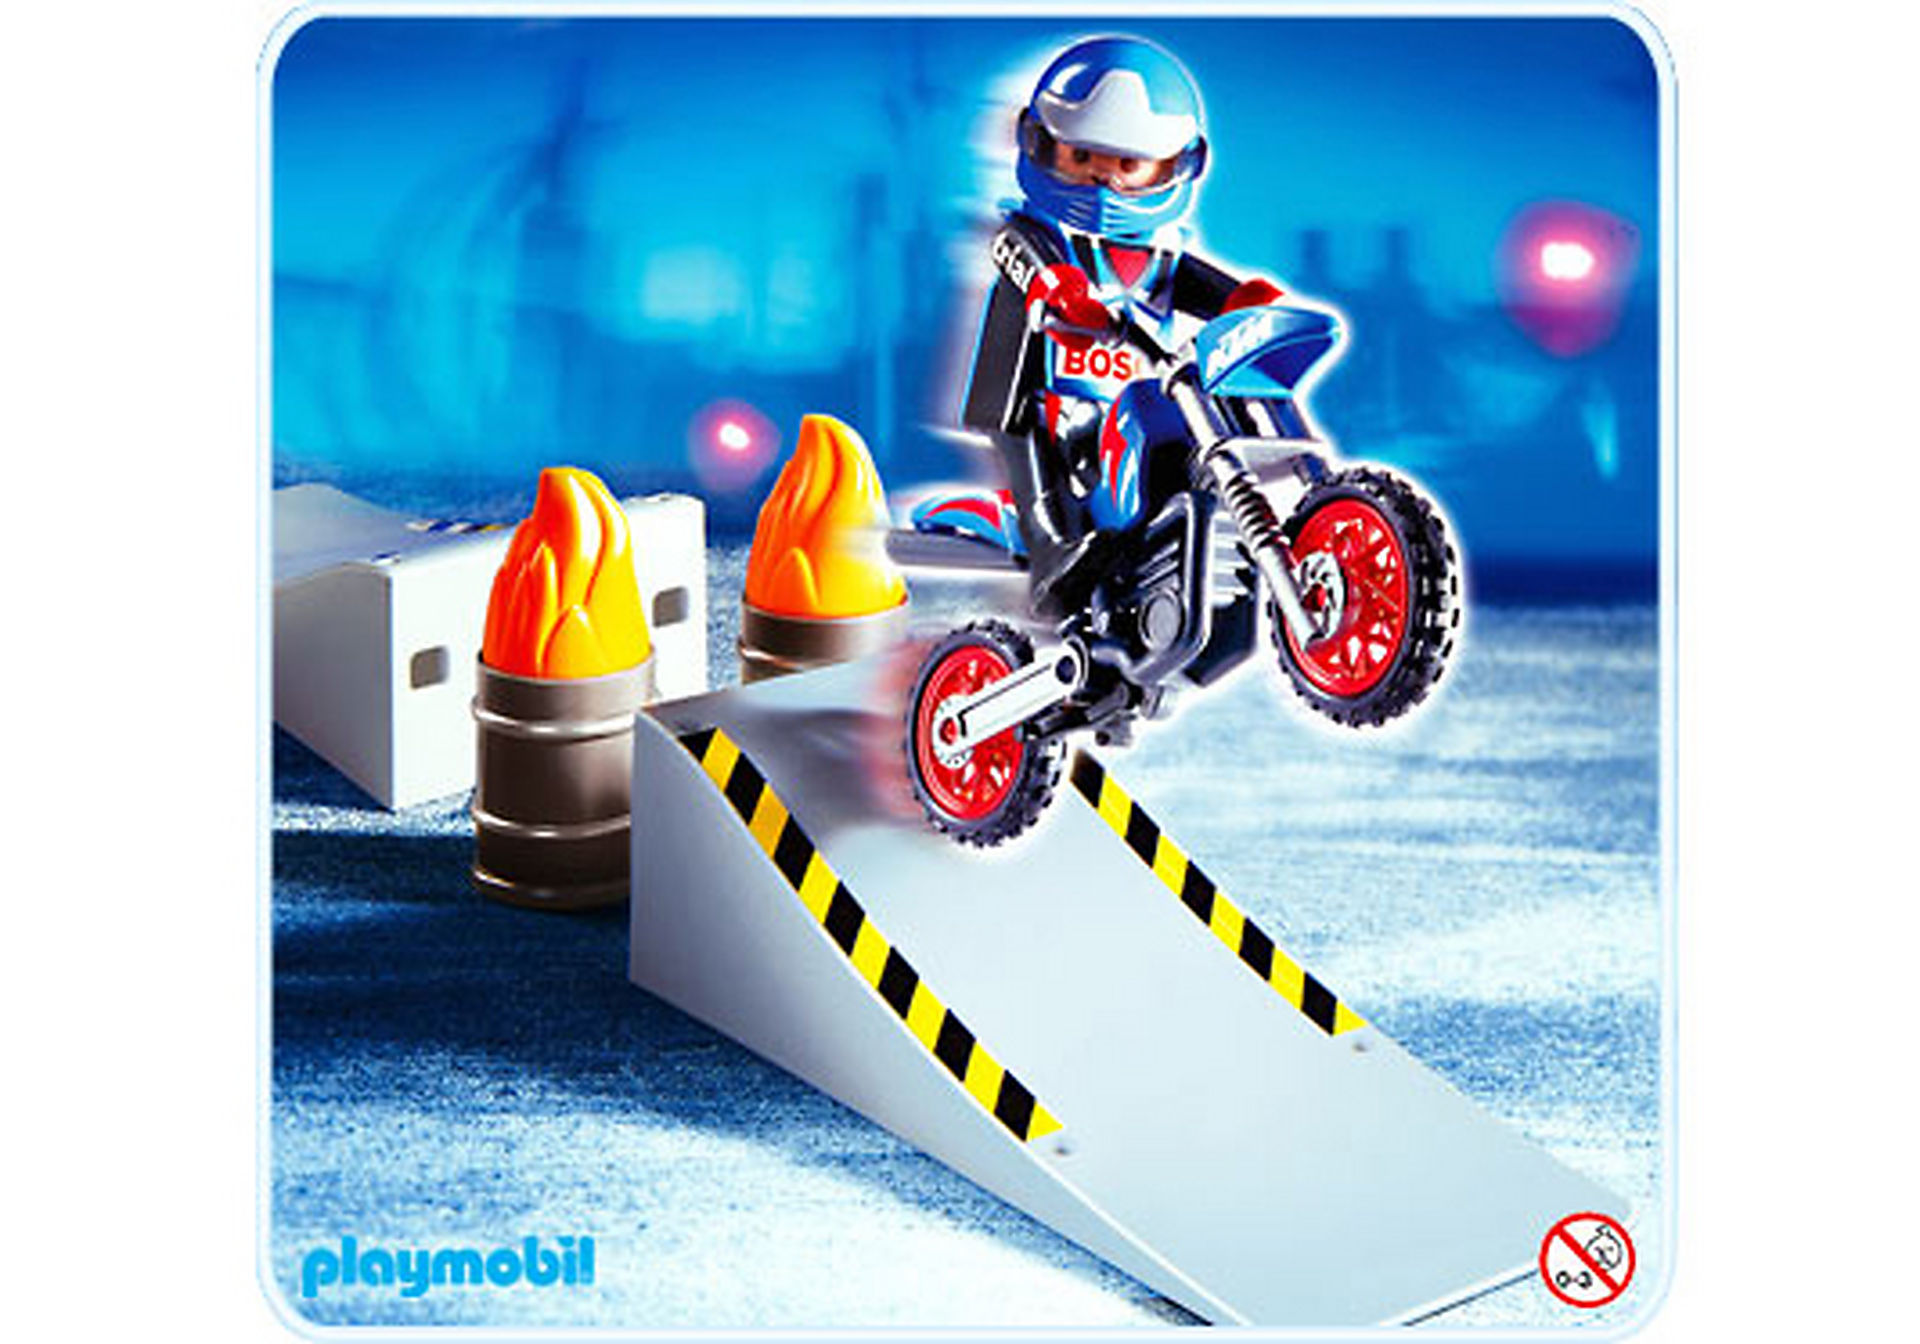 4416-A Motocross-Fahrer mit Rampe zoom image1